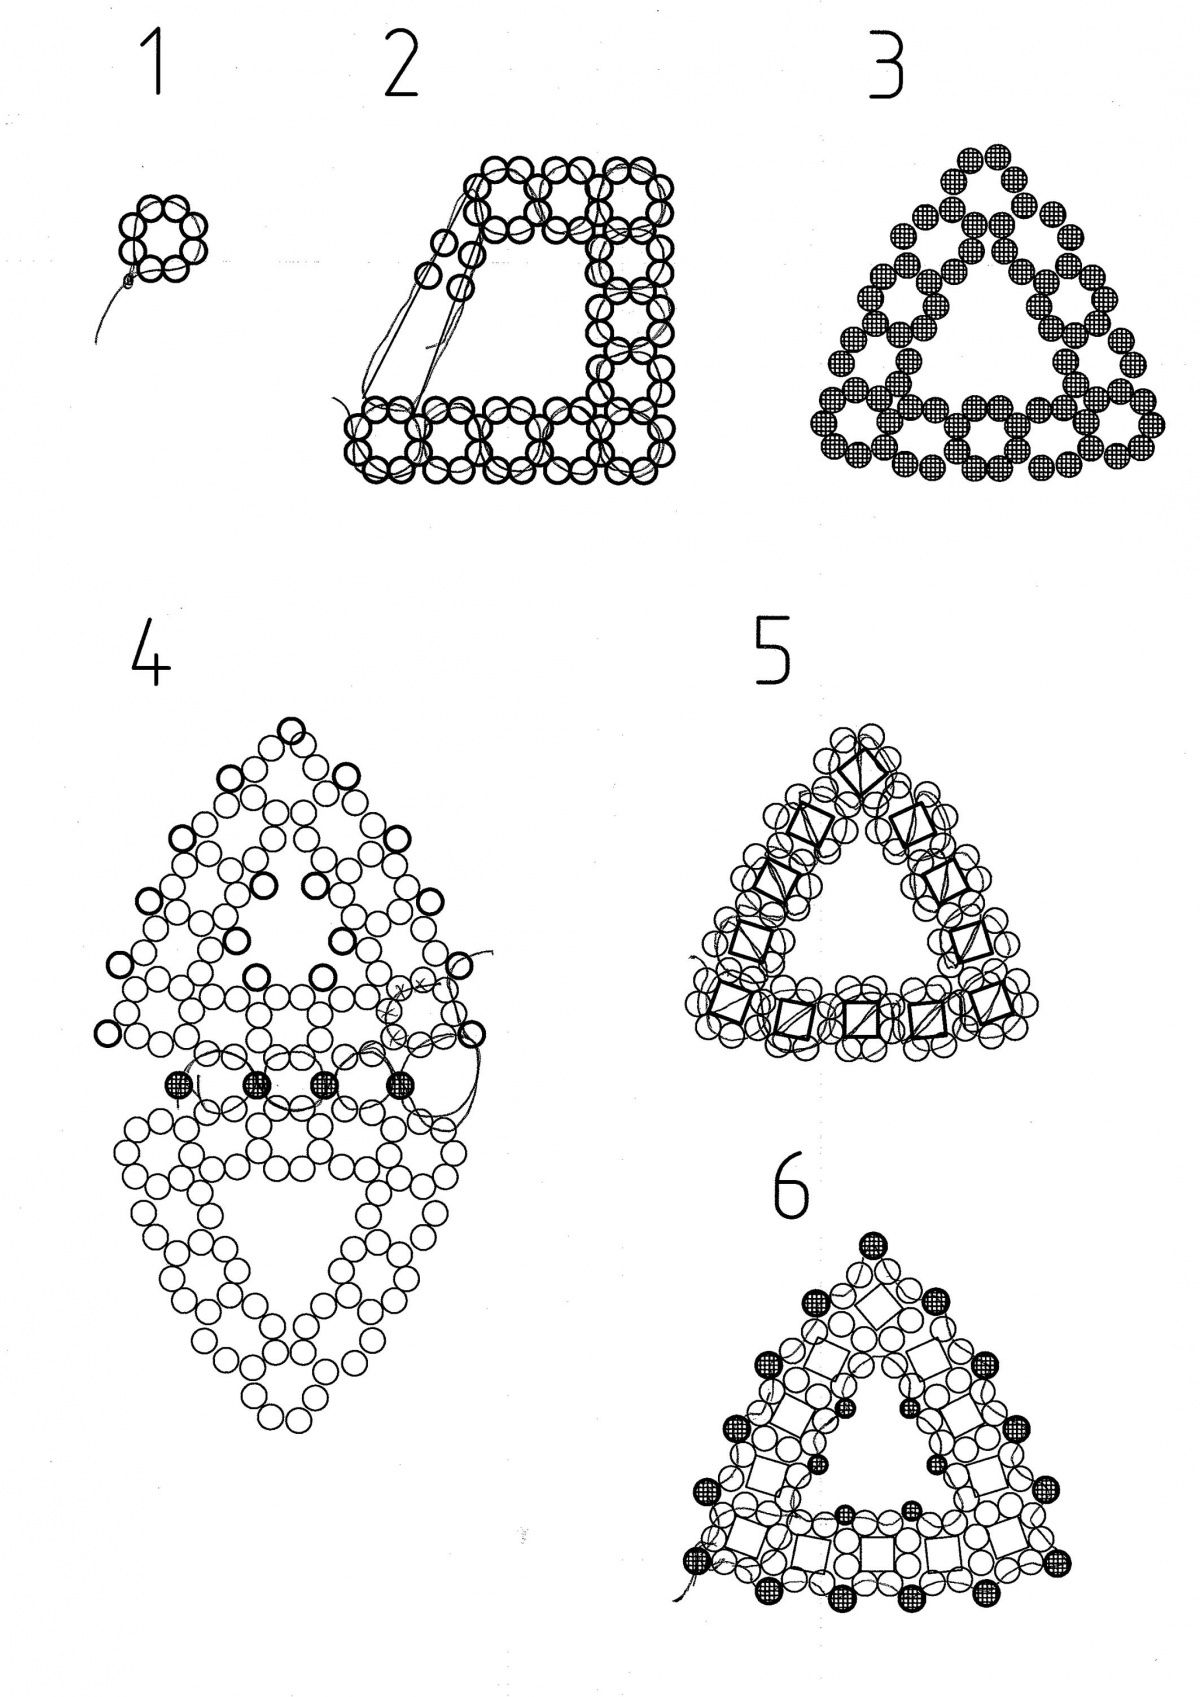 Embellished Raw Triangle Schema Seed Bead Tutorials